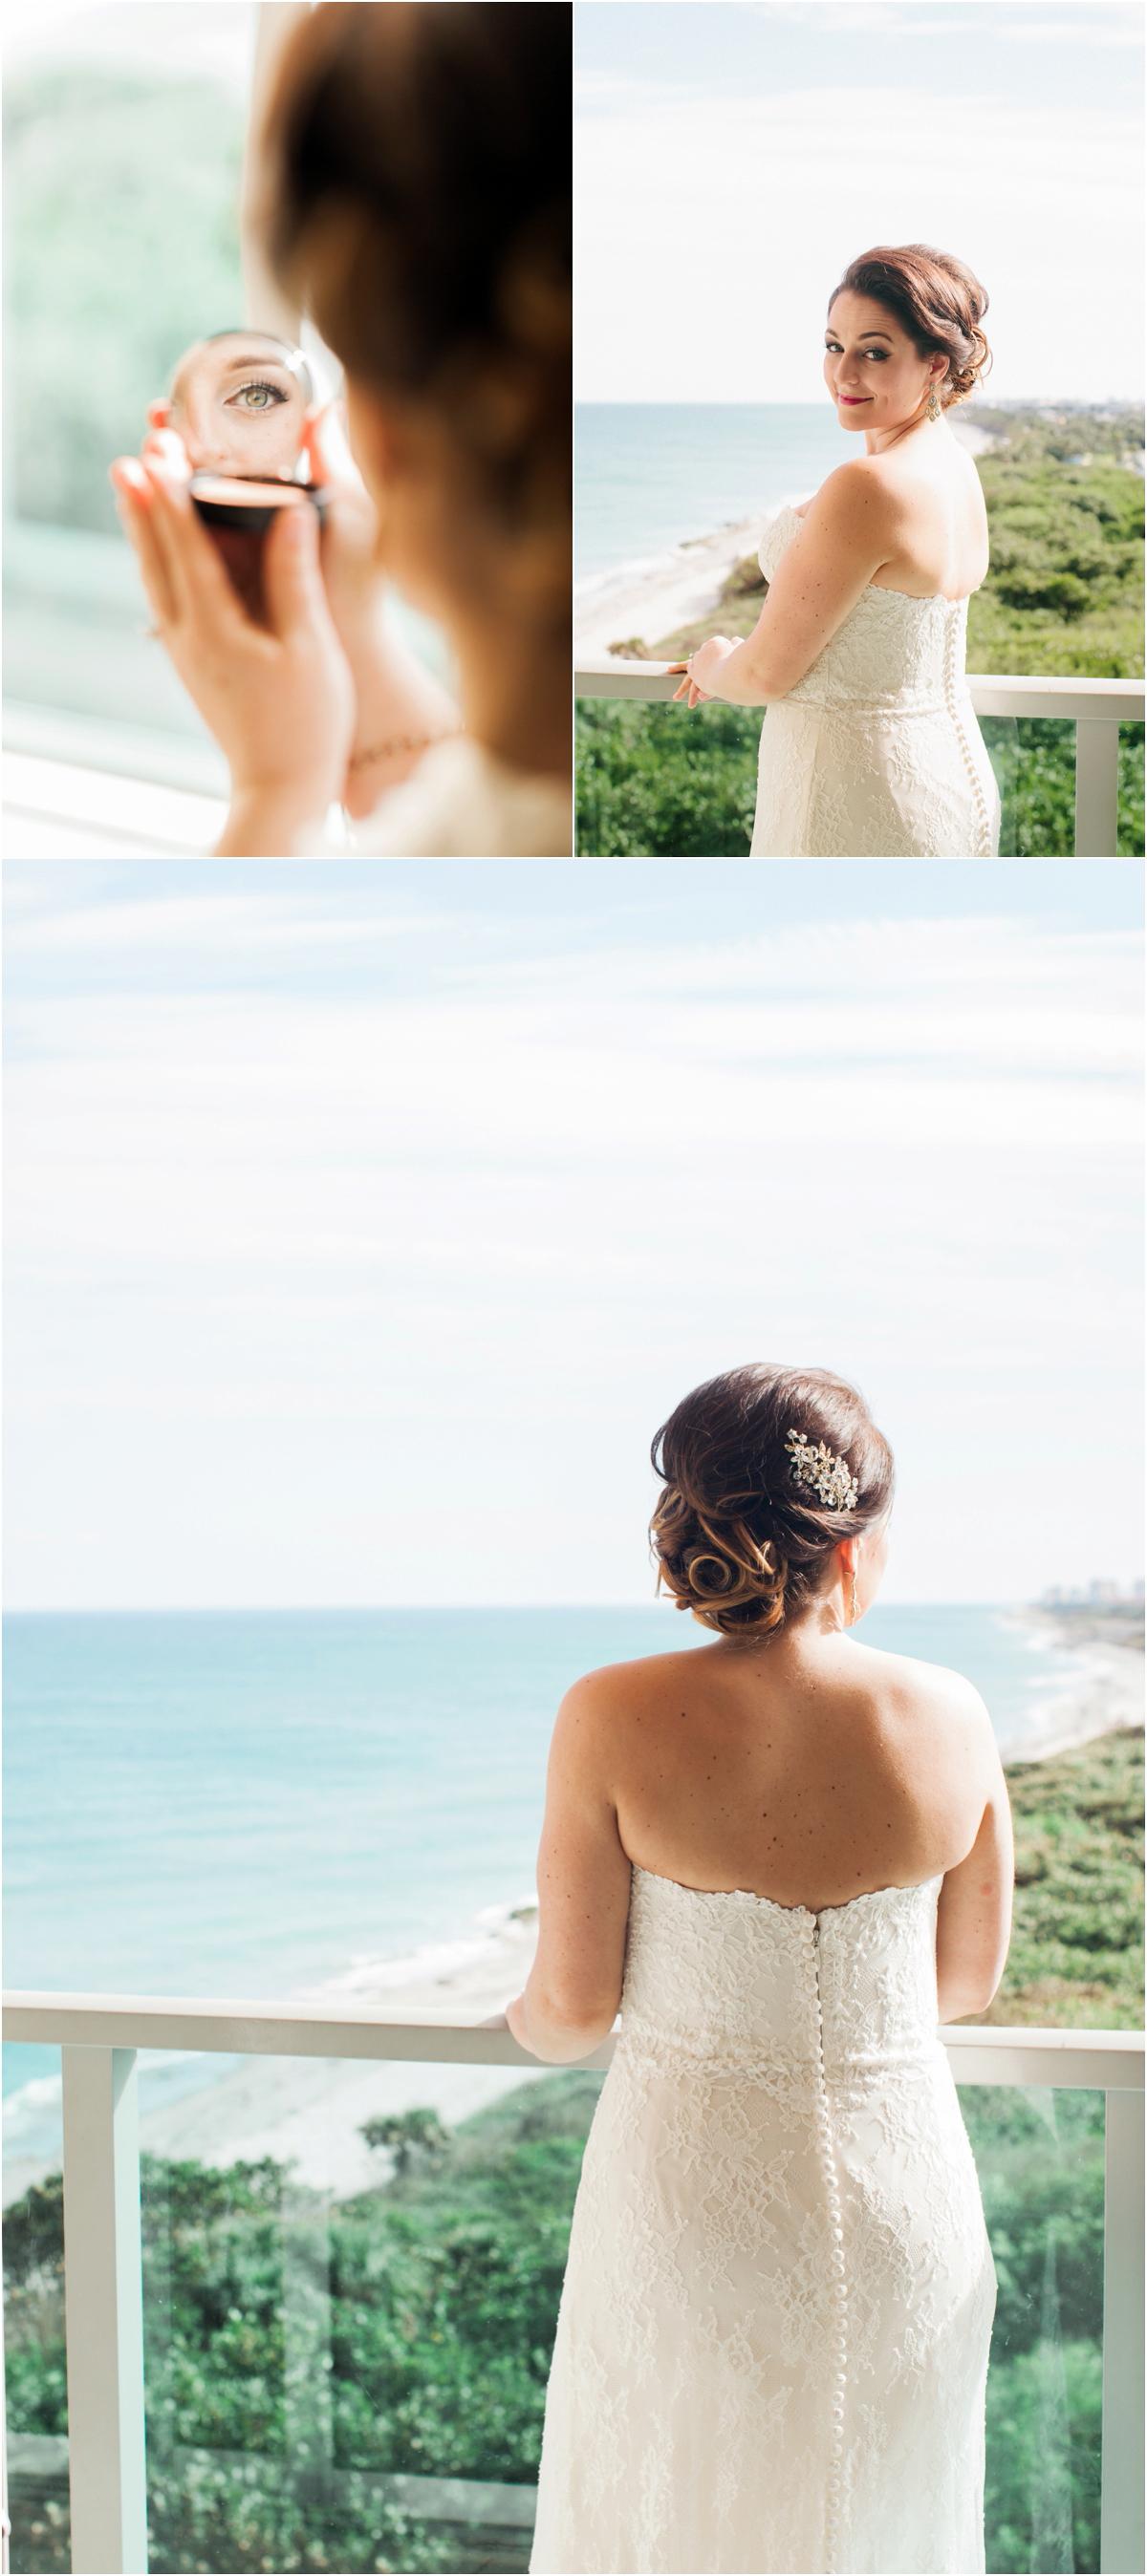 Jupiter-Beach-Resort-Wedding-Venue-photos_0005